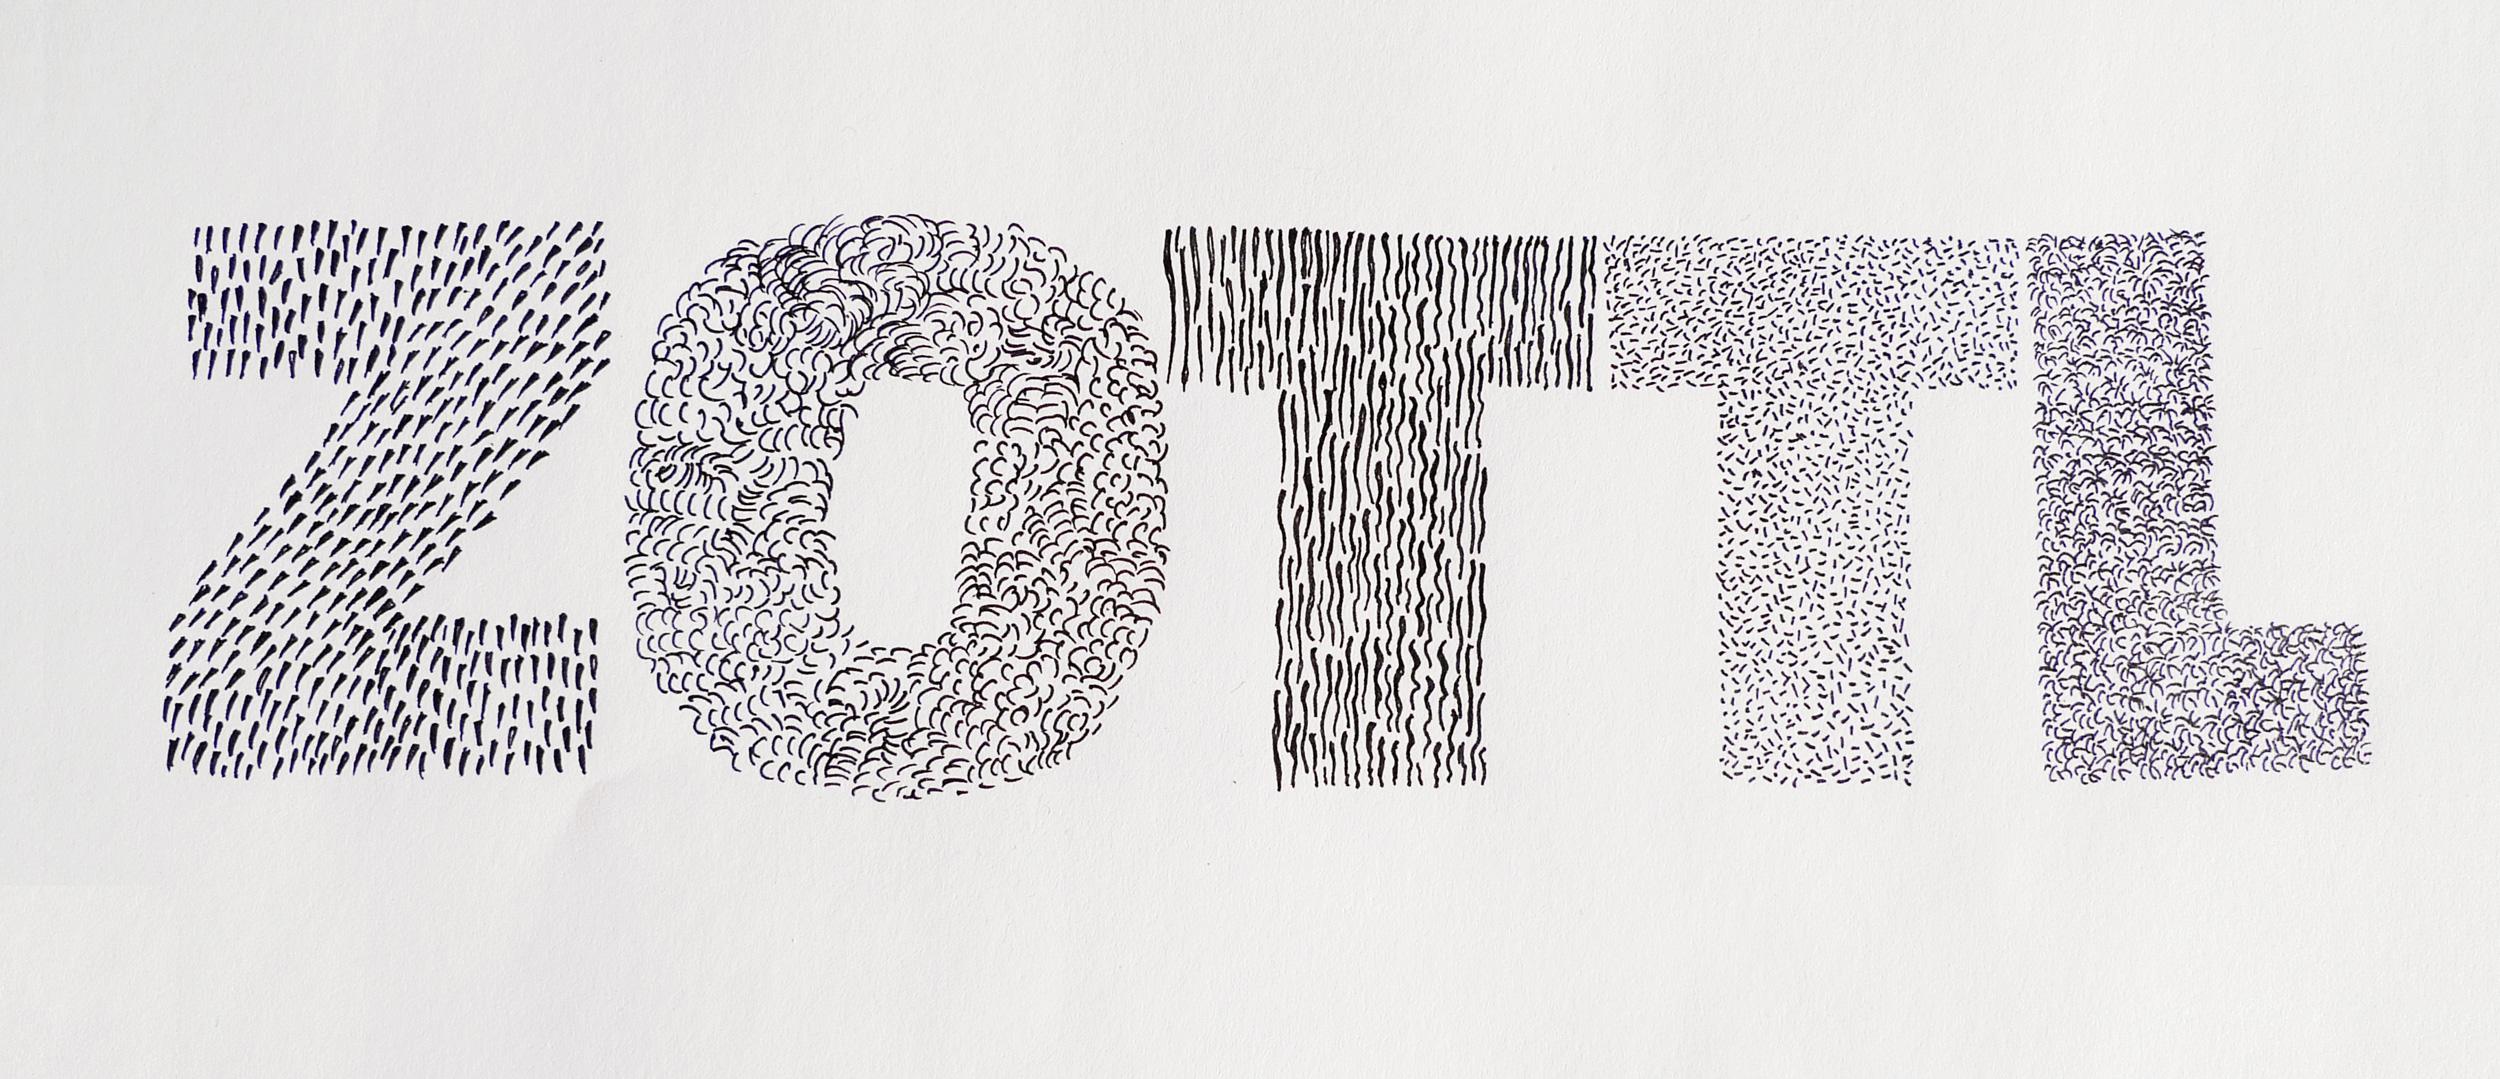 zottl-lettering-03